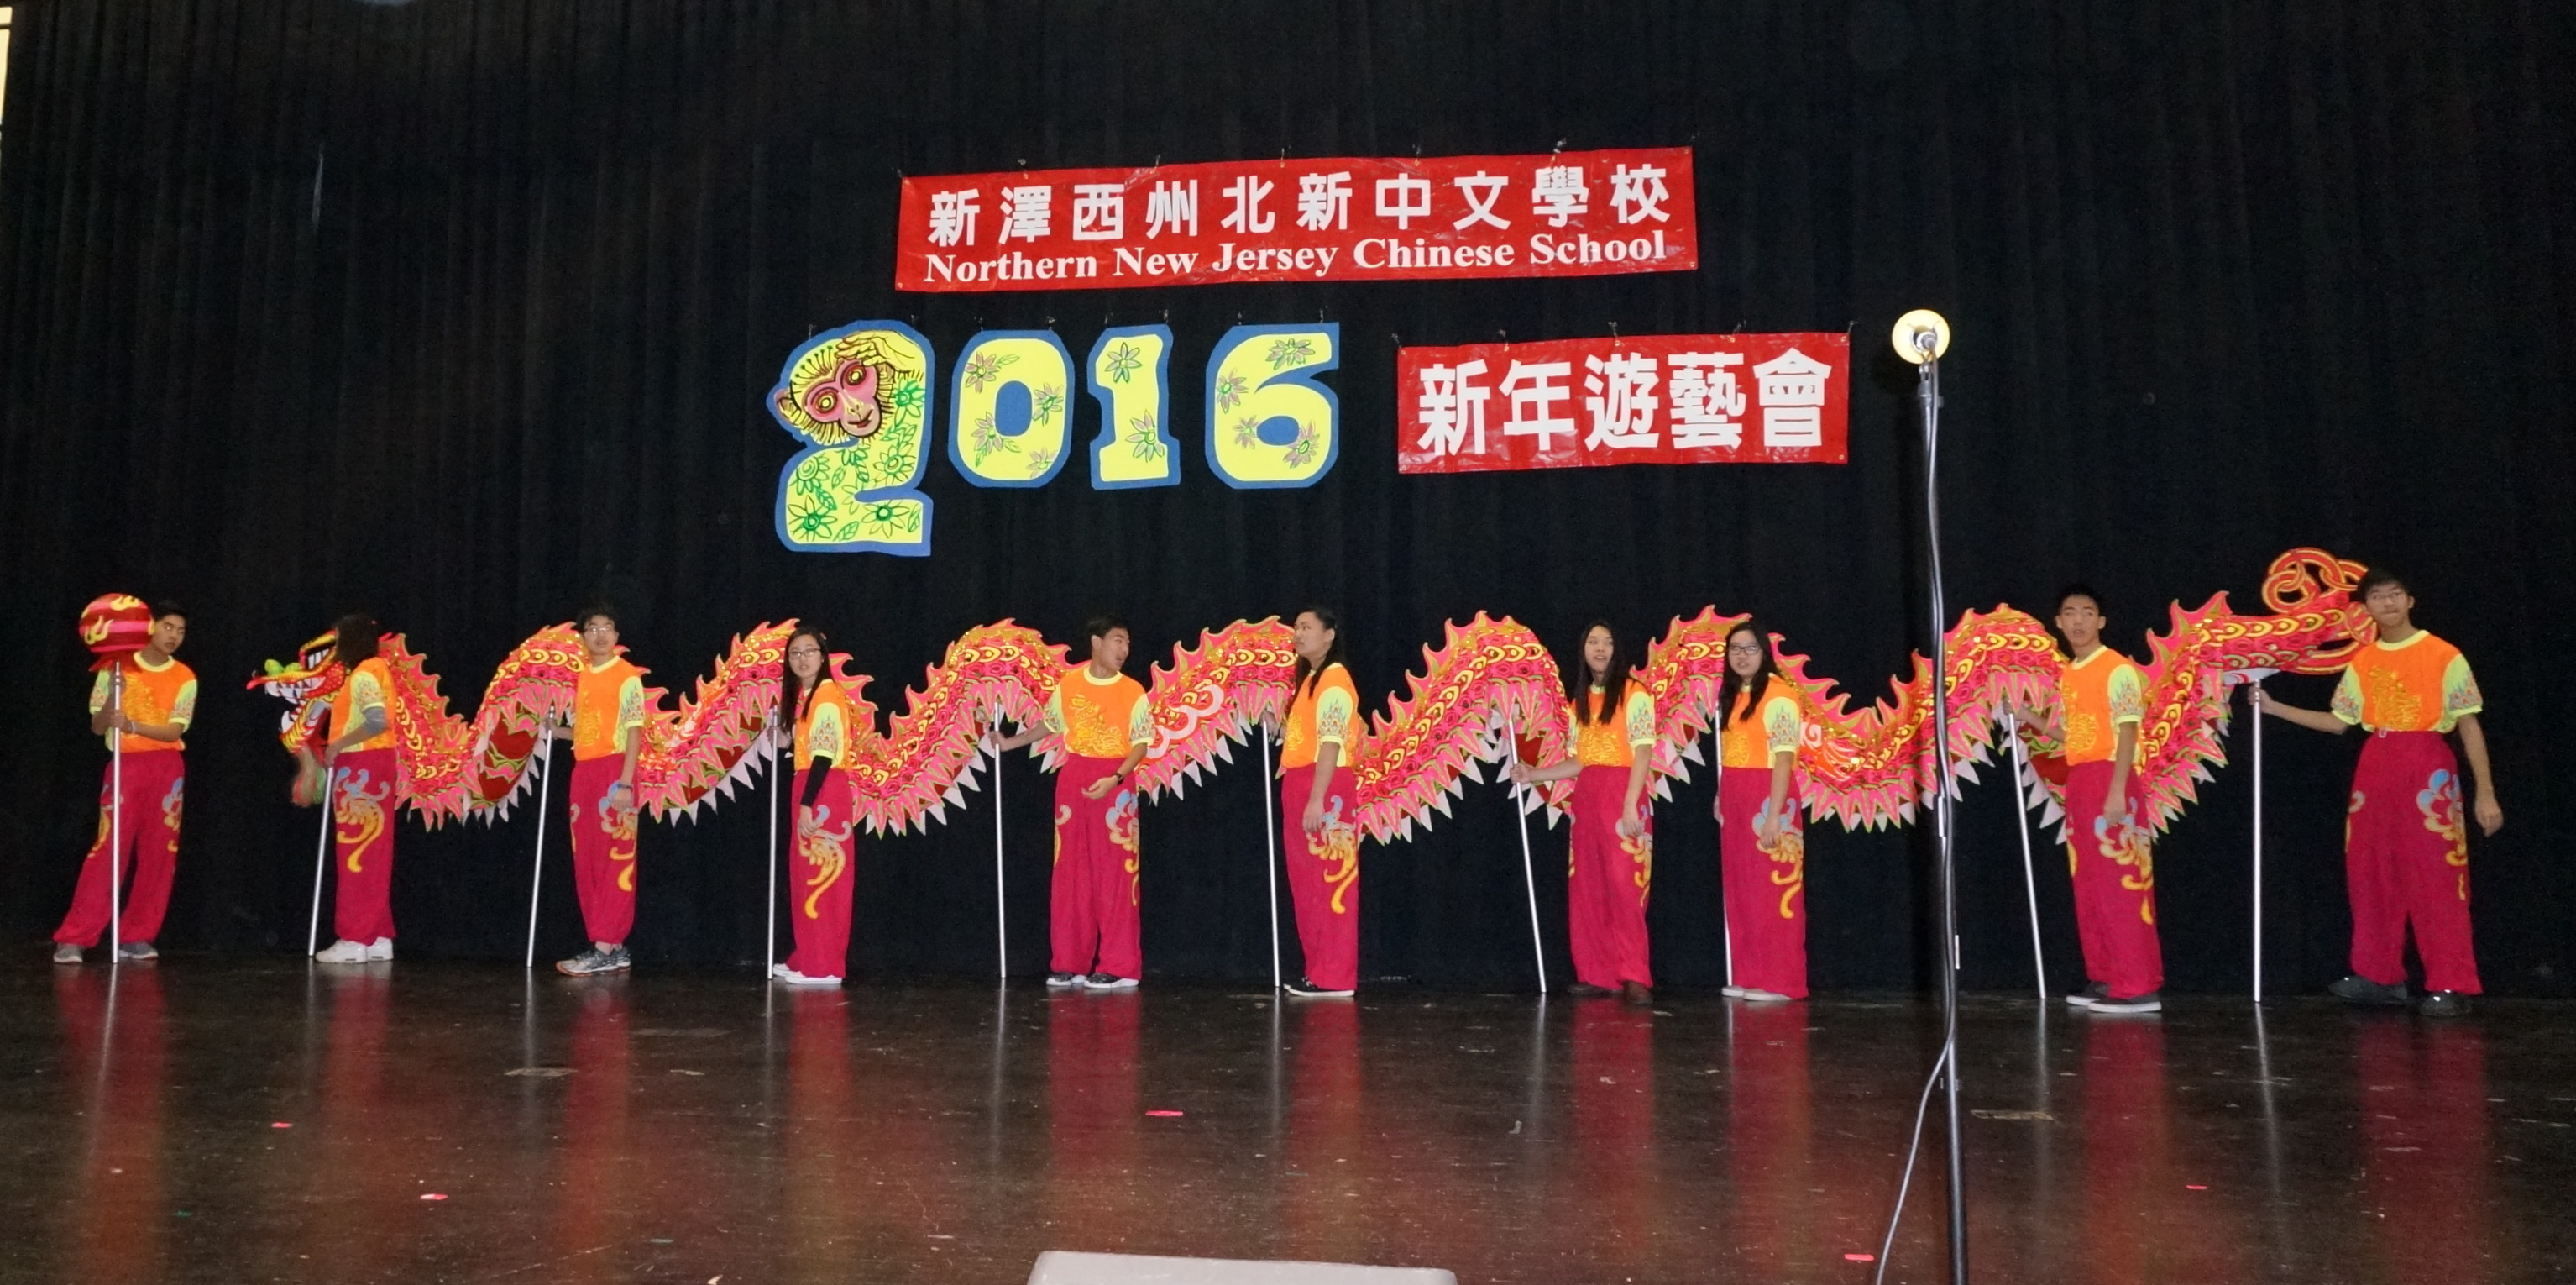 29148db0809cfc39afbc_aaa_Chinese_New_Year_pix_004.JPG